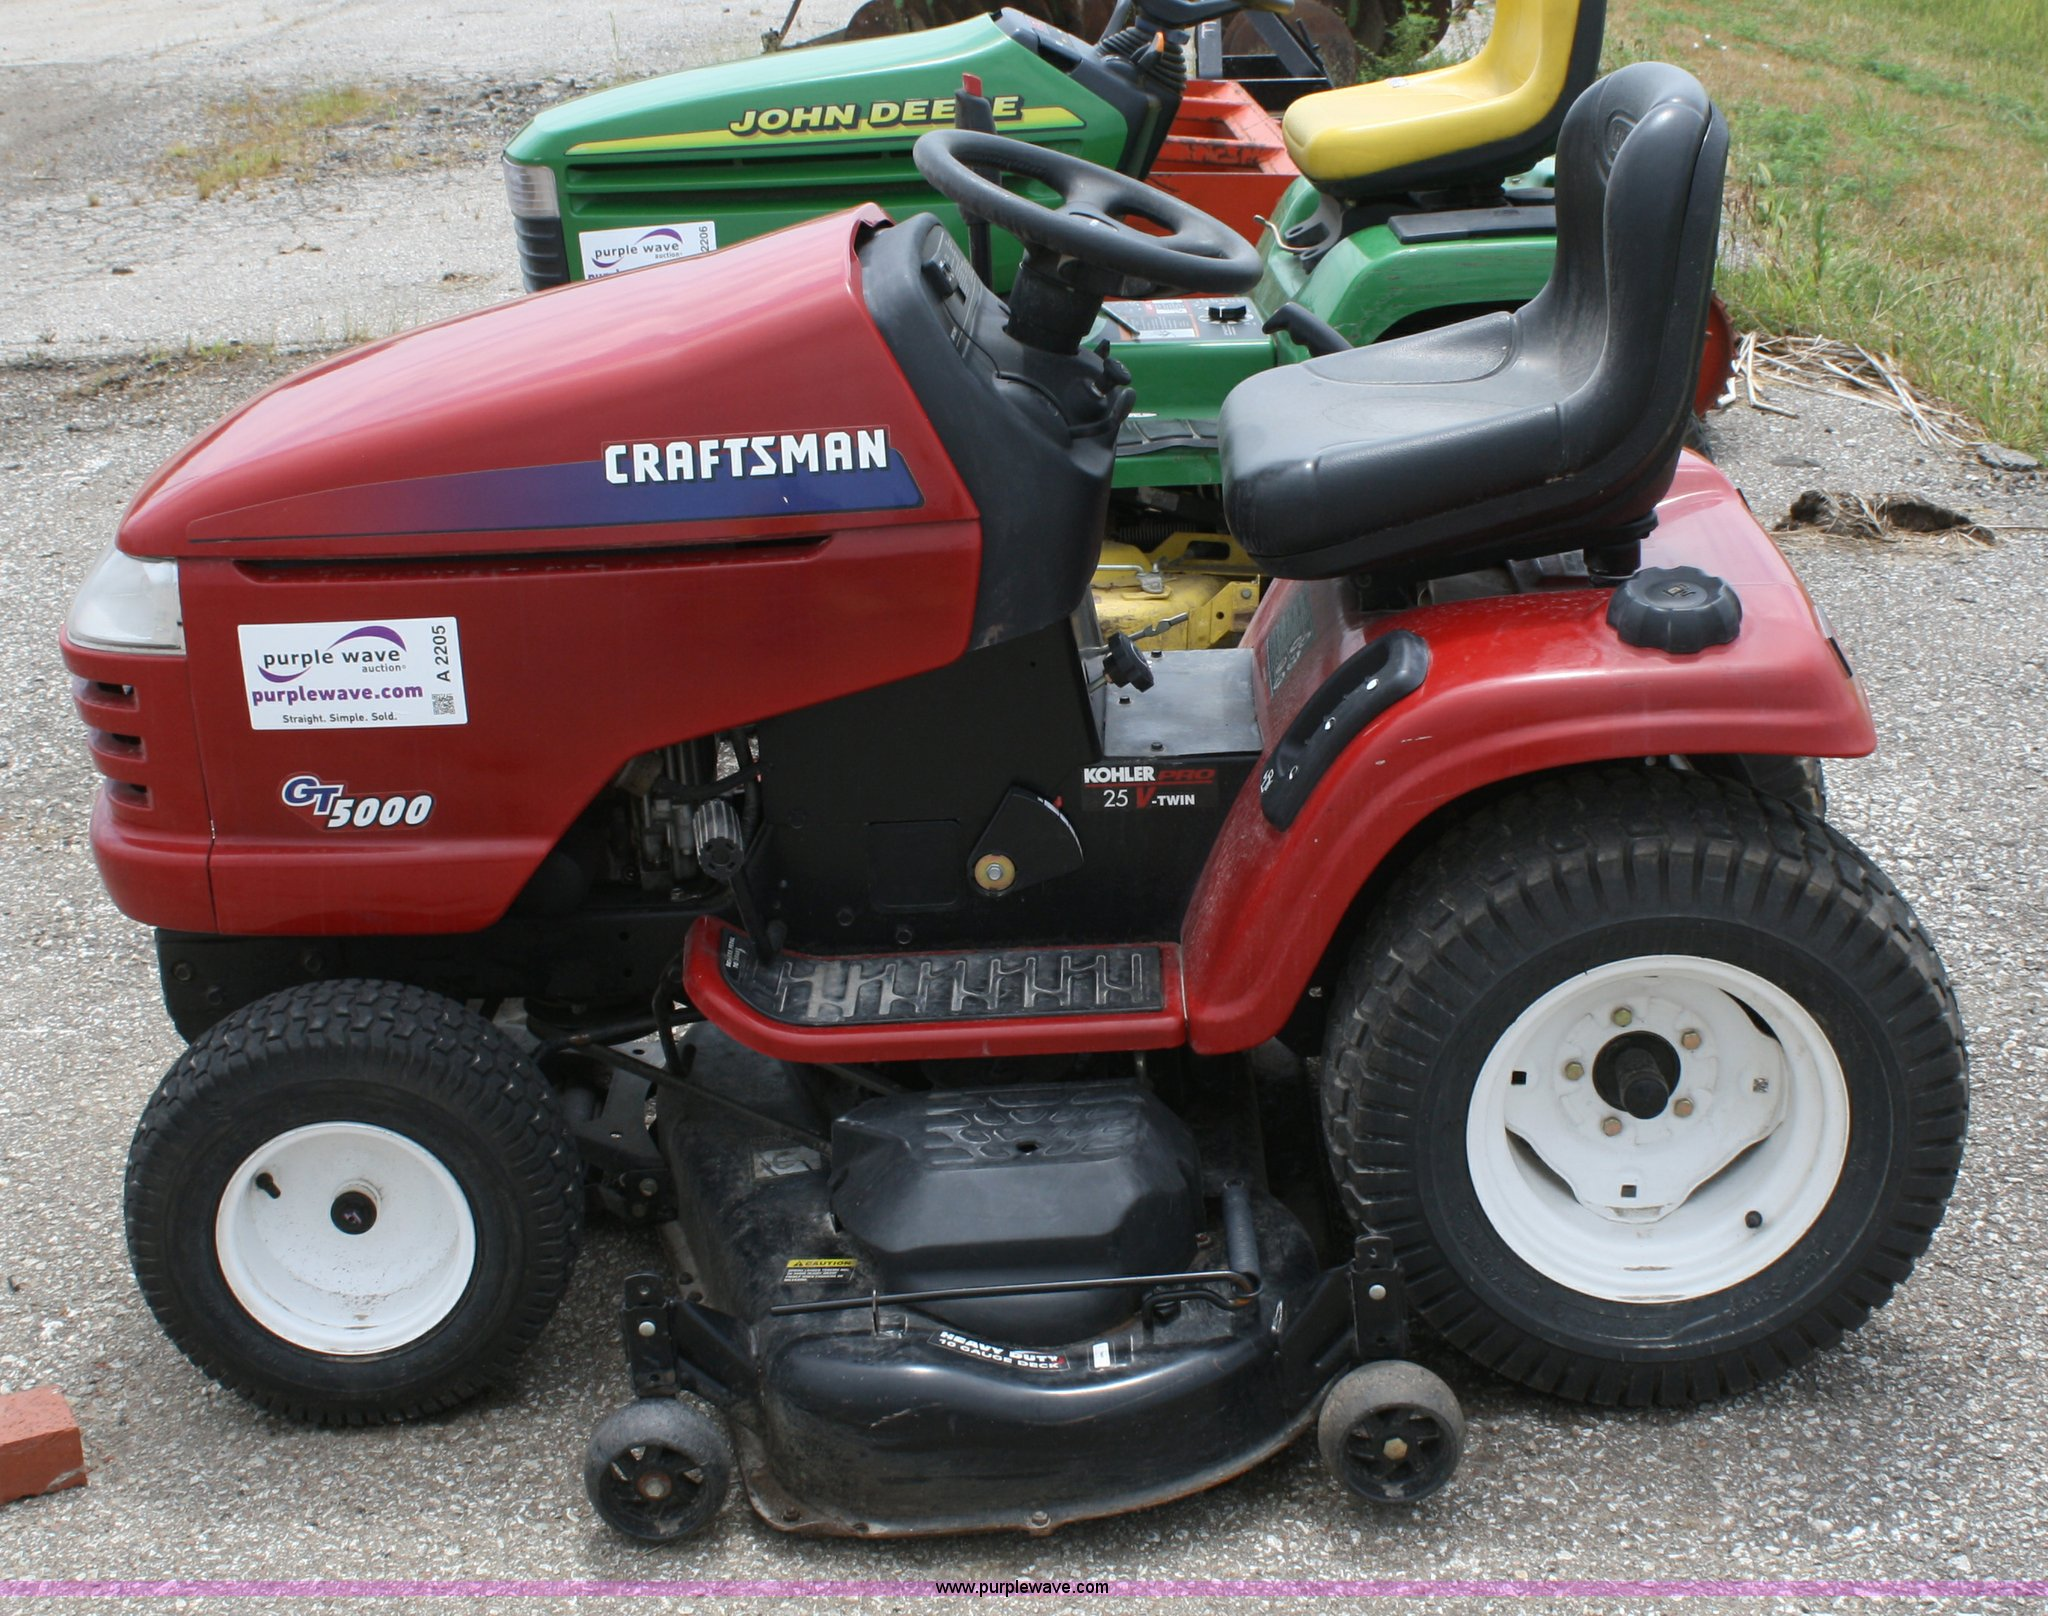 Craftsman Gt5000 Garden Tractor Review Garden Ftempo